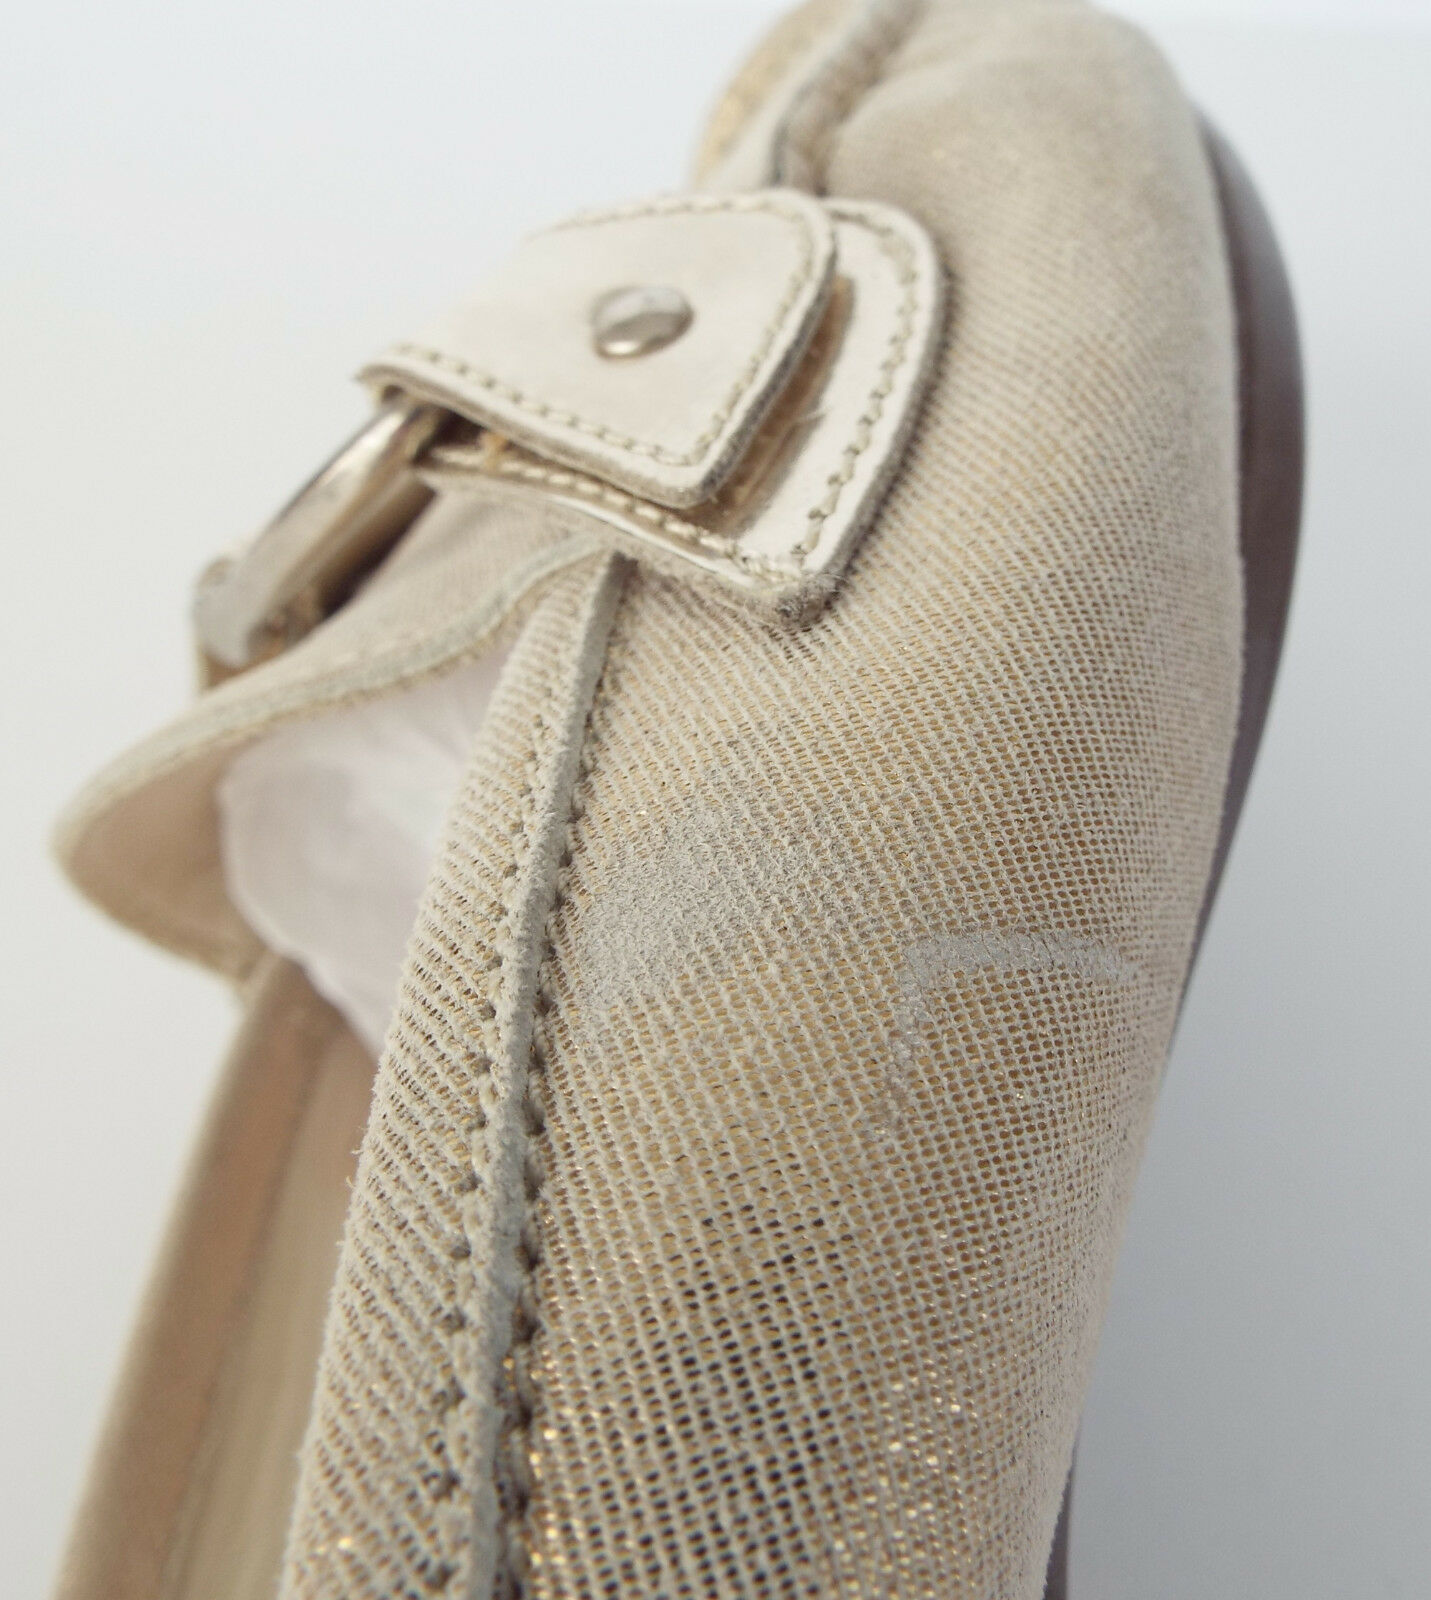 AGL ATTILIO GIUSTI LEOMBRUNI Size 6.5 gold Shimmer Mules shoes shoes shoes 36 1 2 31bd54